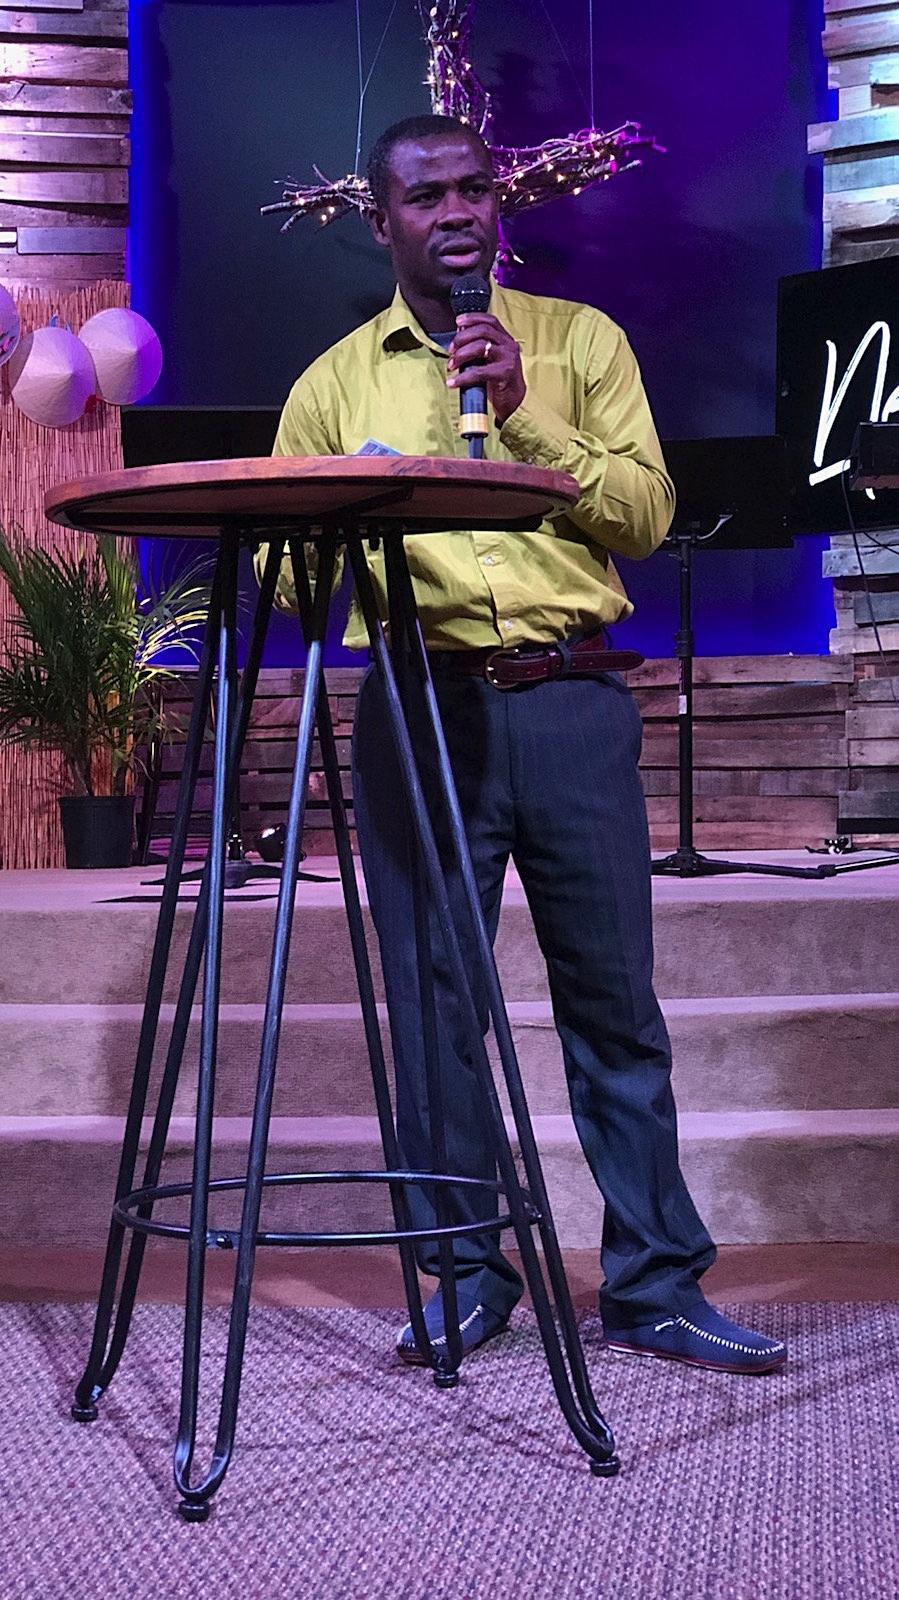 Associate Pastor Simon Hie